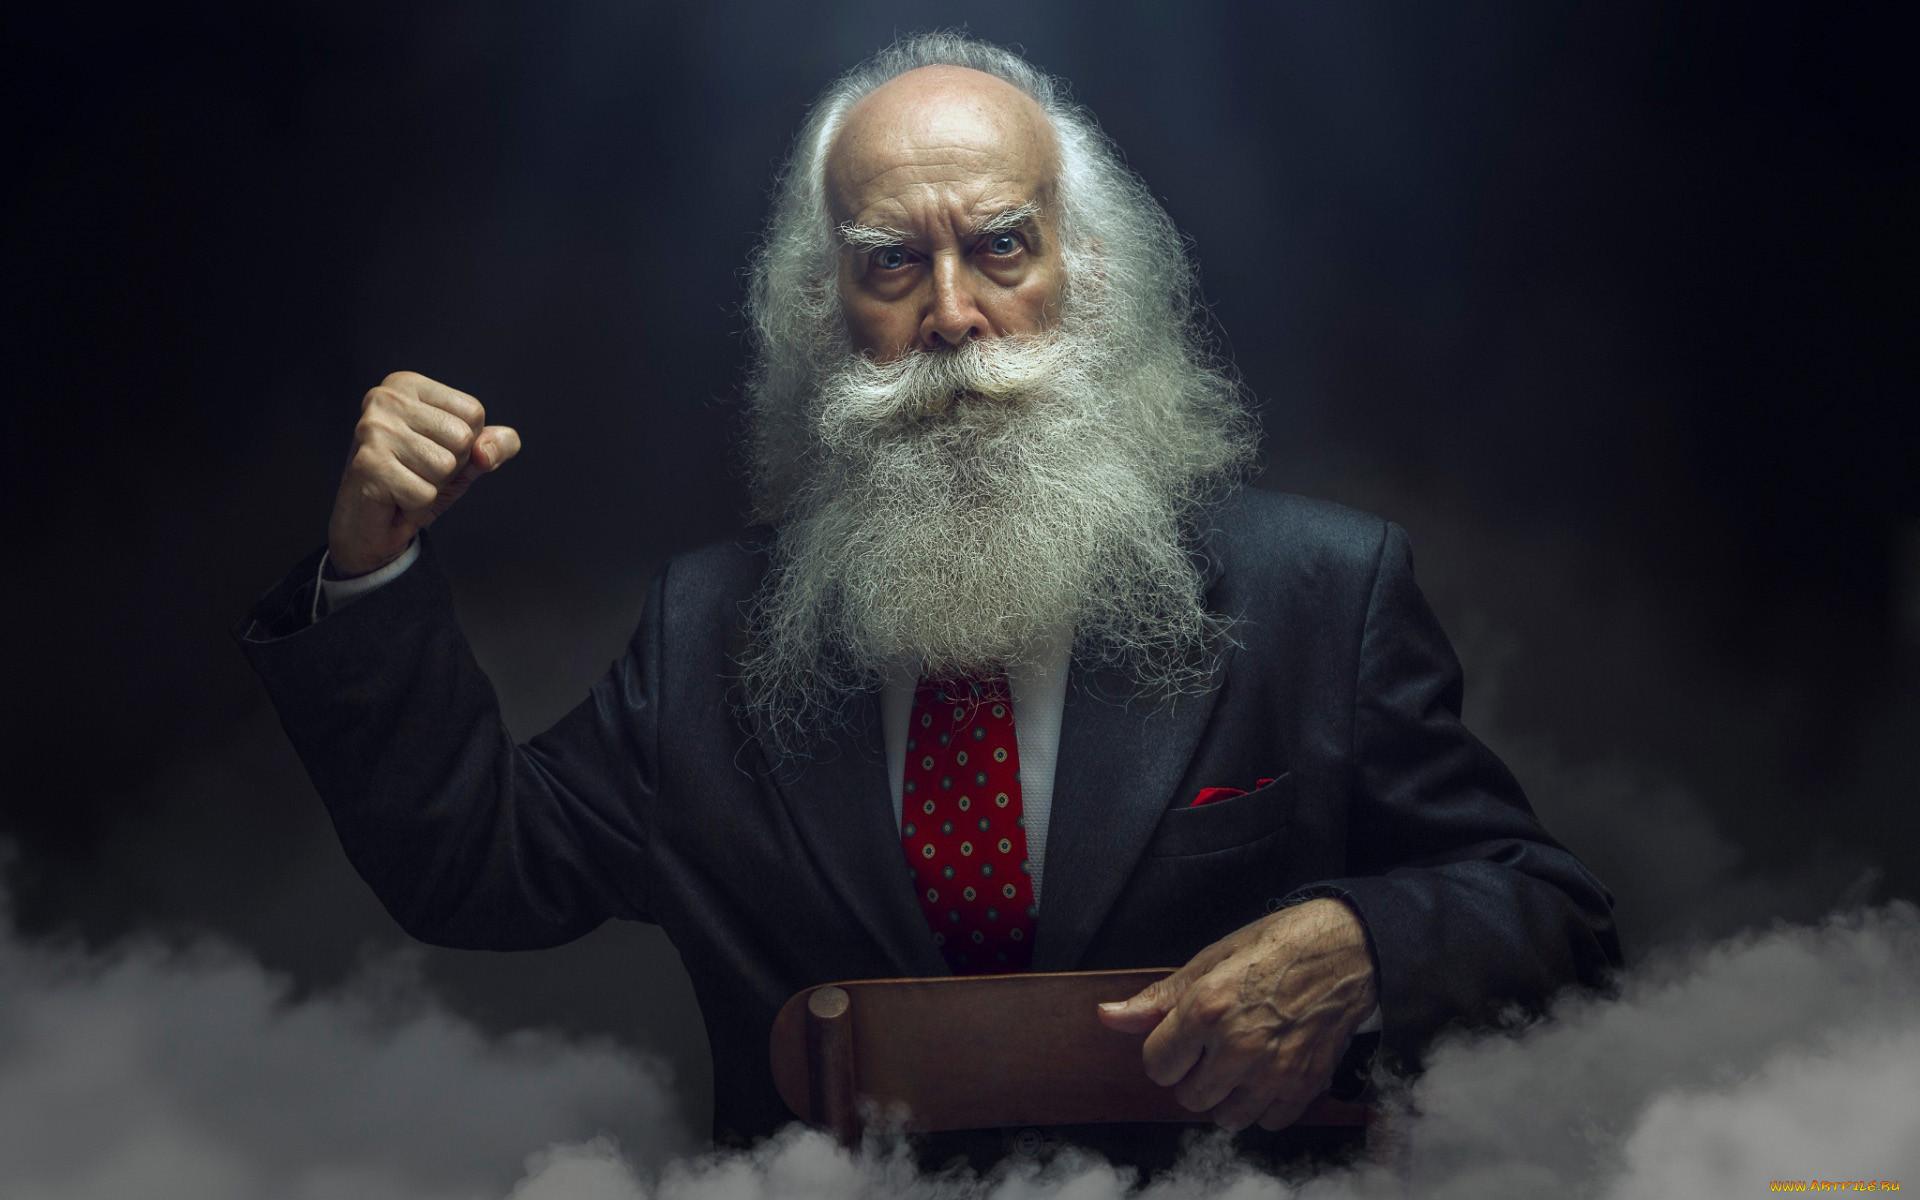 мужчины, - unsort, седина, борода, жест